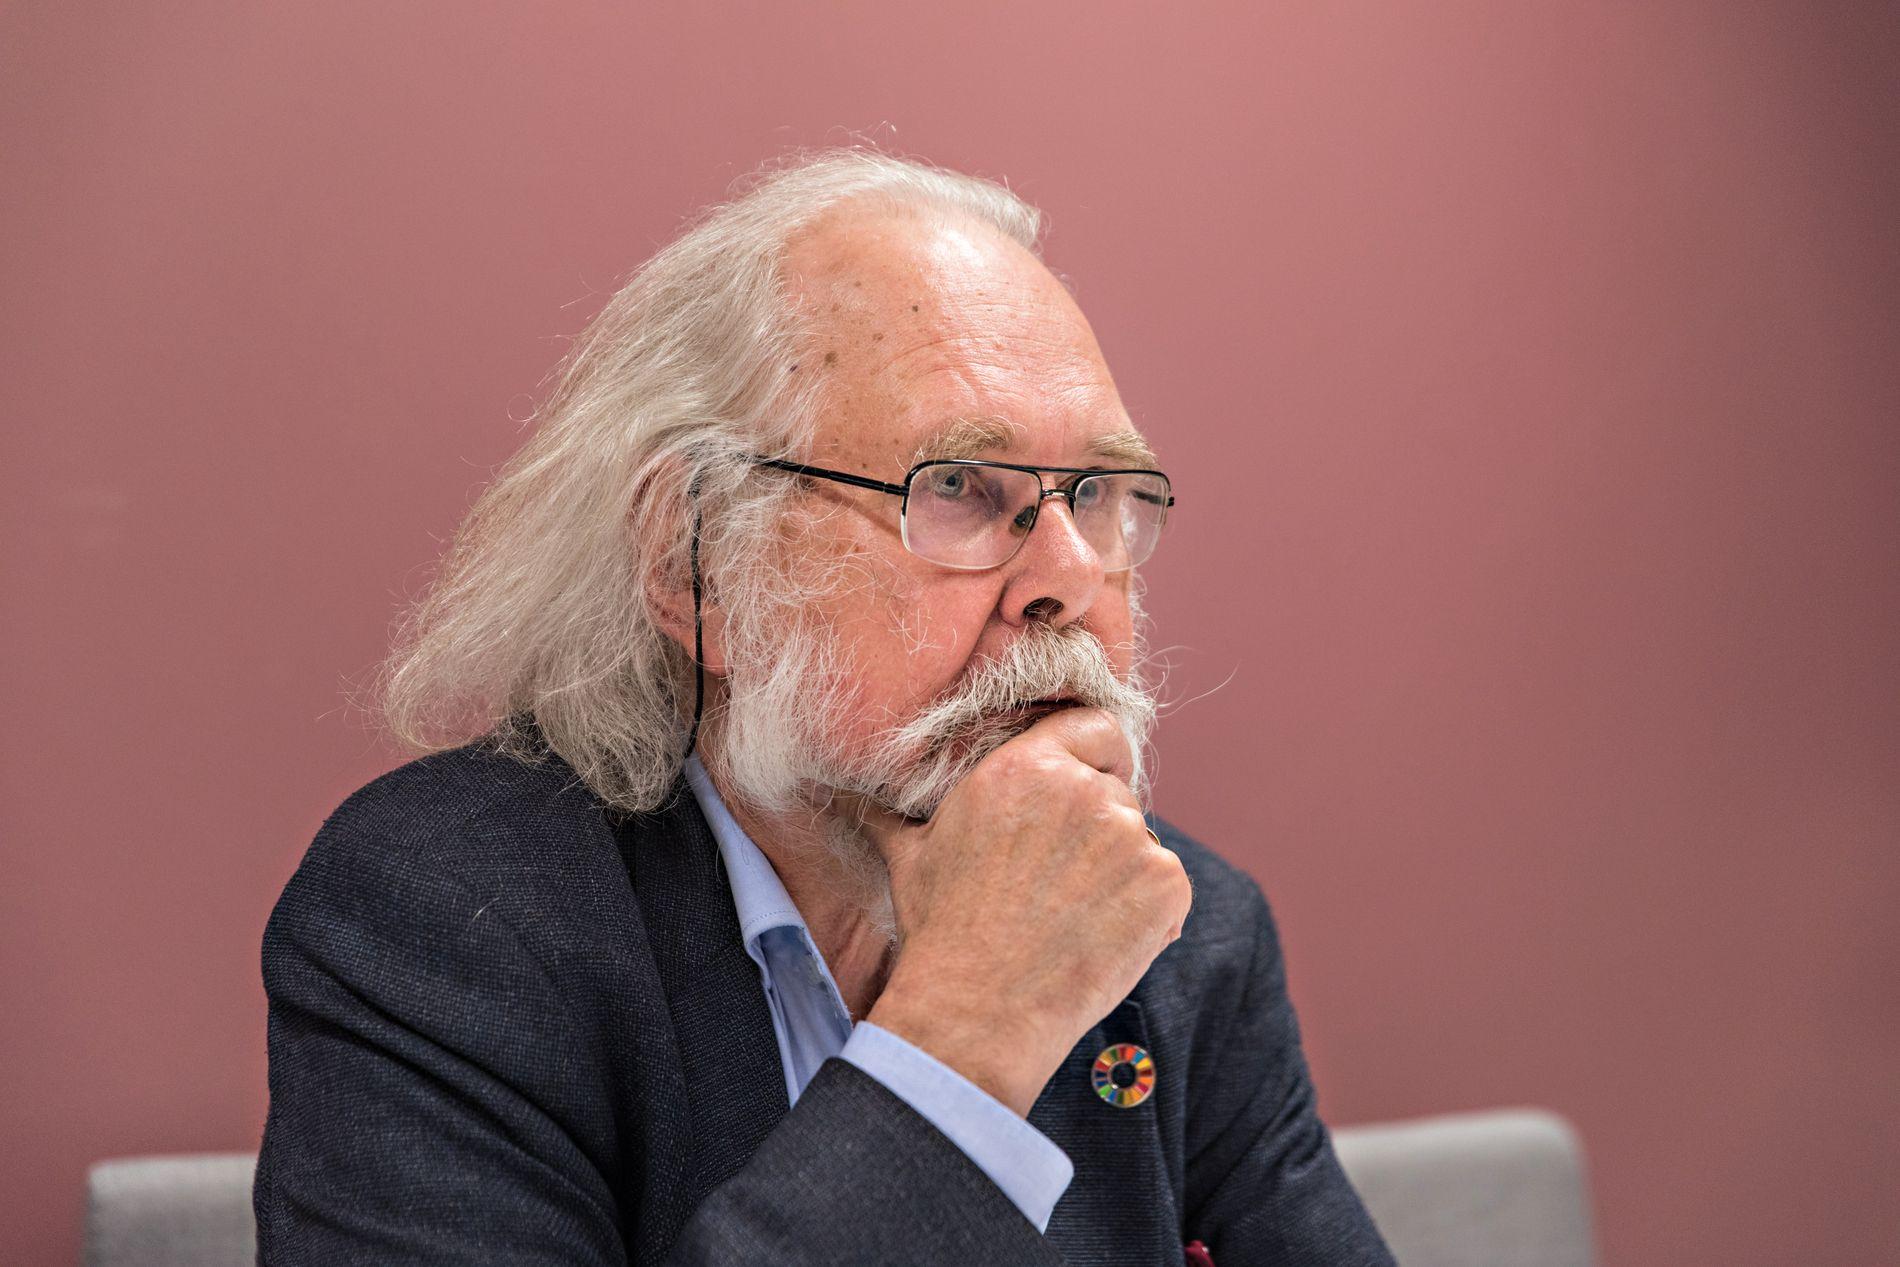 GRANSKET: Biologiprofessor Nils Christian Stenseth.